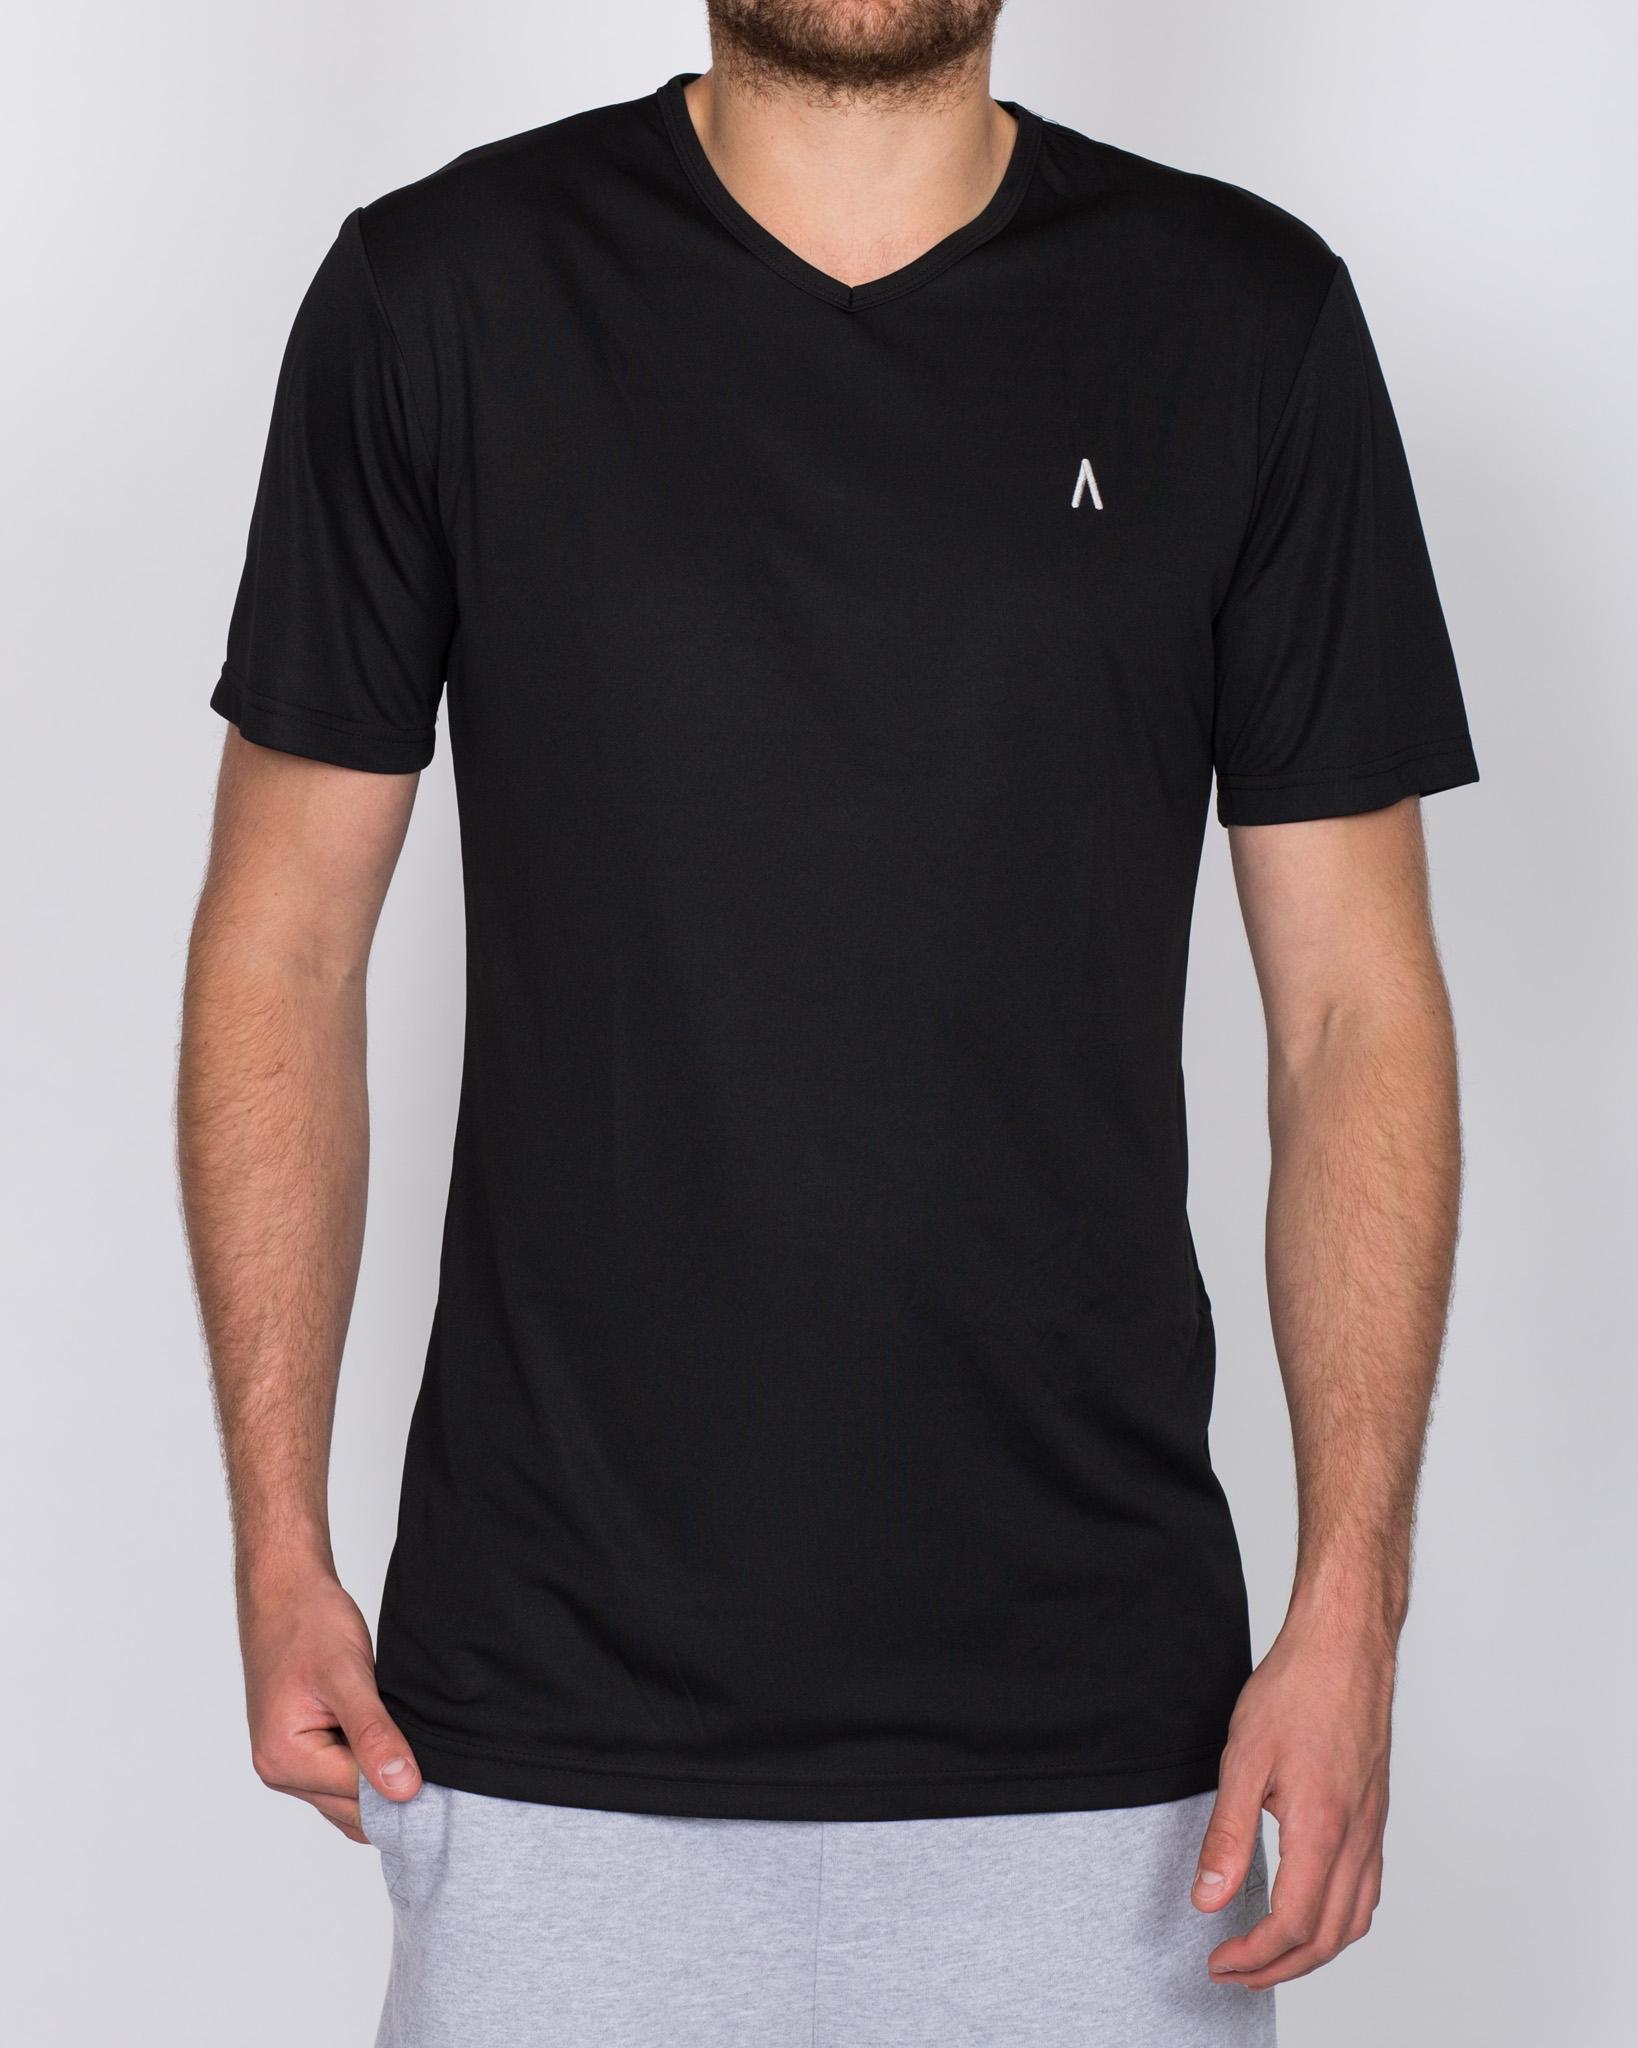 2t V-Neck Training Top (black)